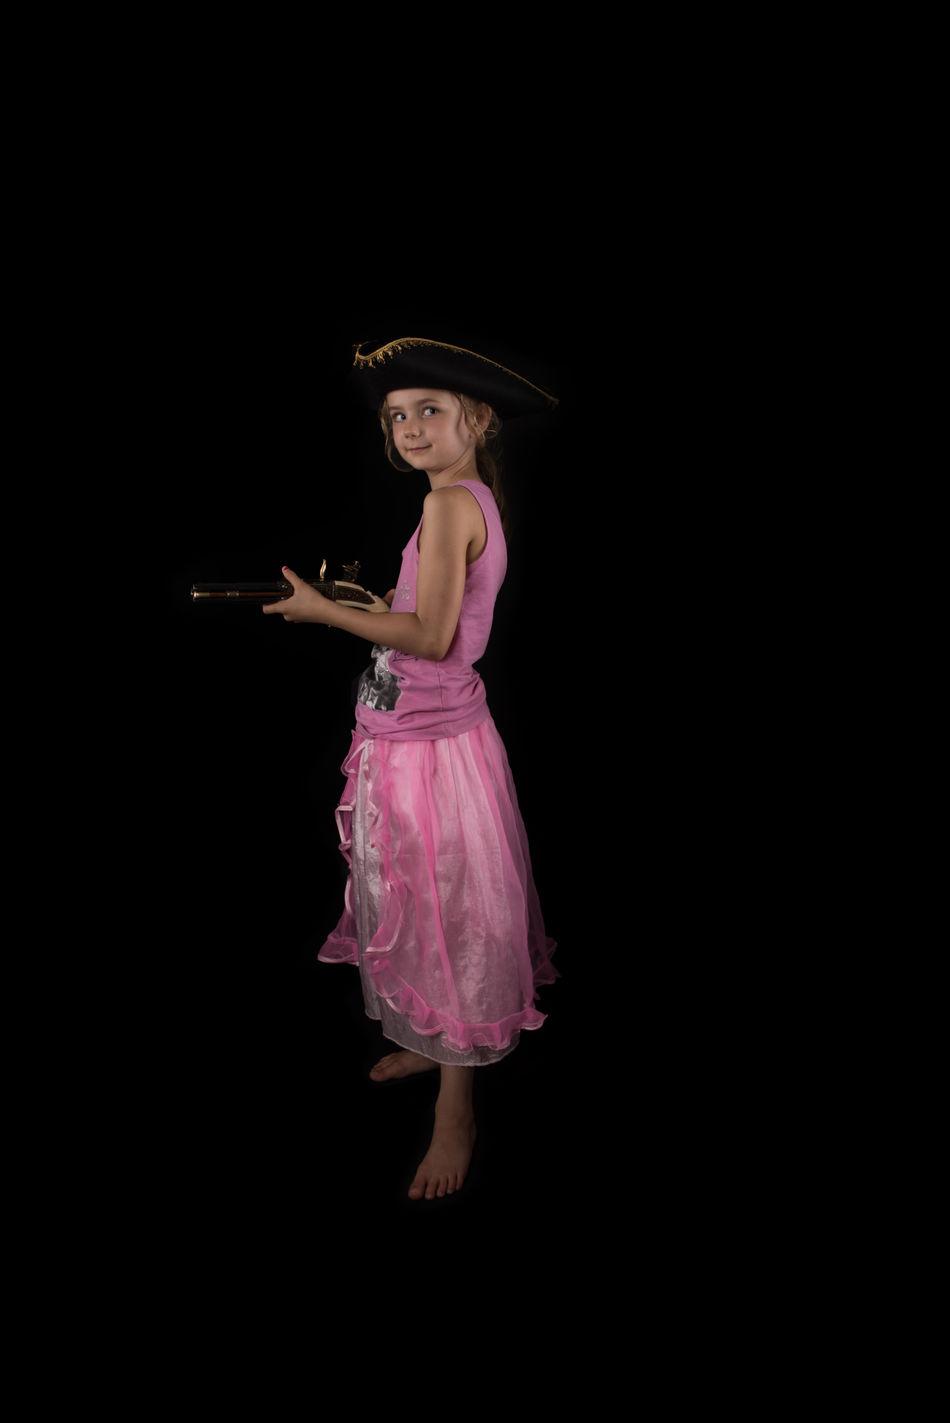 Beautiful stock photos of piraten,  6-7 Years,  Black Background,  Caucasian Ethnicity,  Childhood